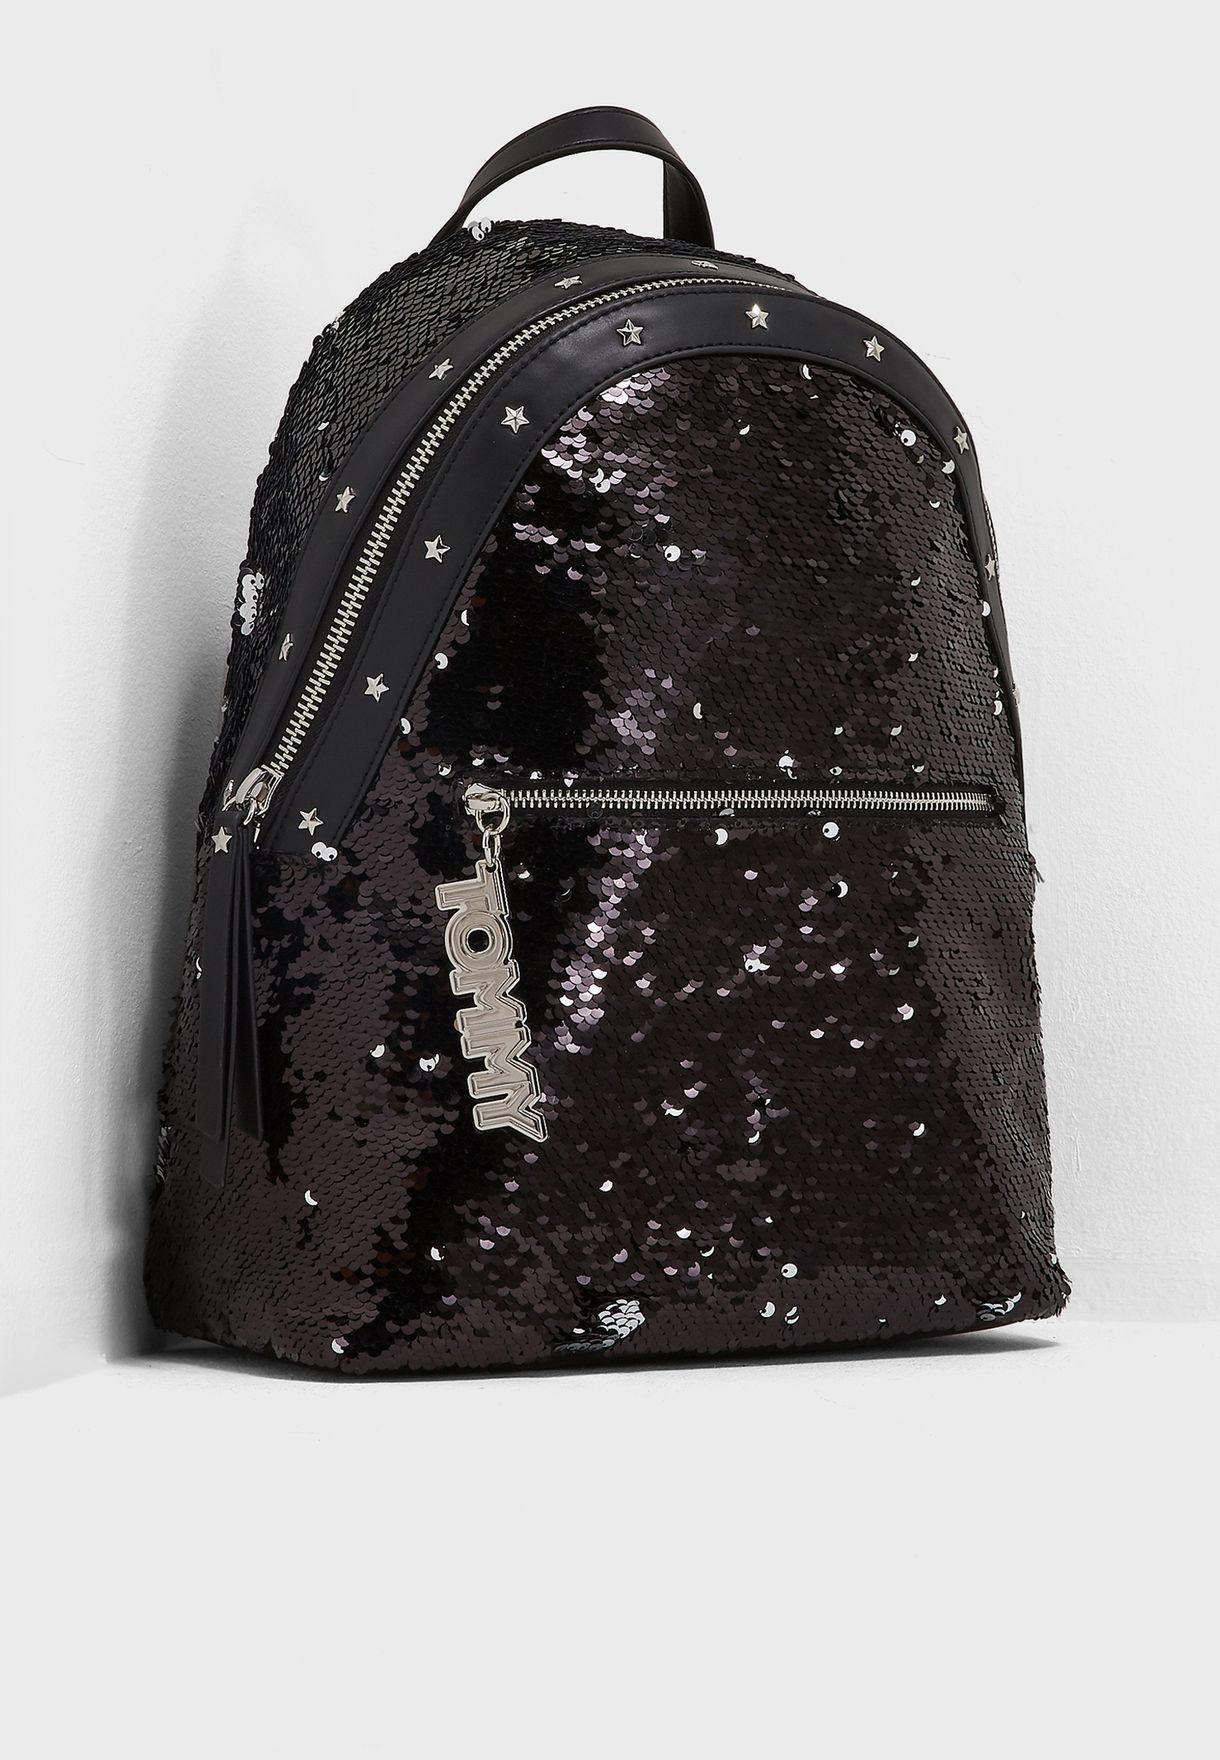 da113bb1 Shop Tommy Hilfiger black Mascot Sequins Backpack AW0AW05873 for ...